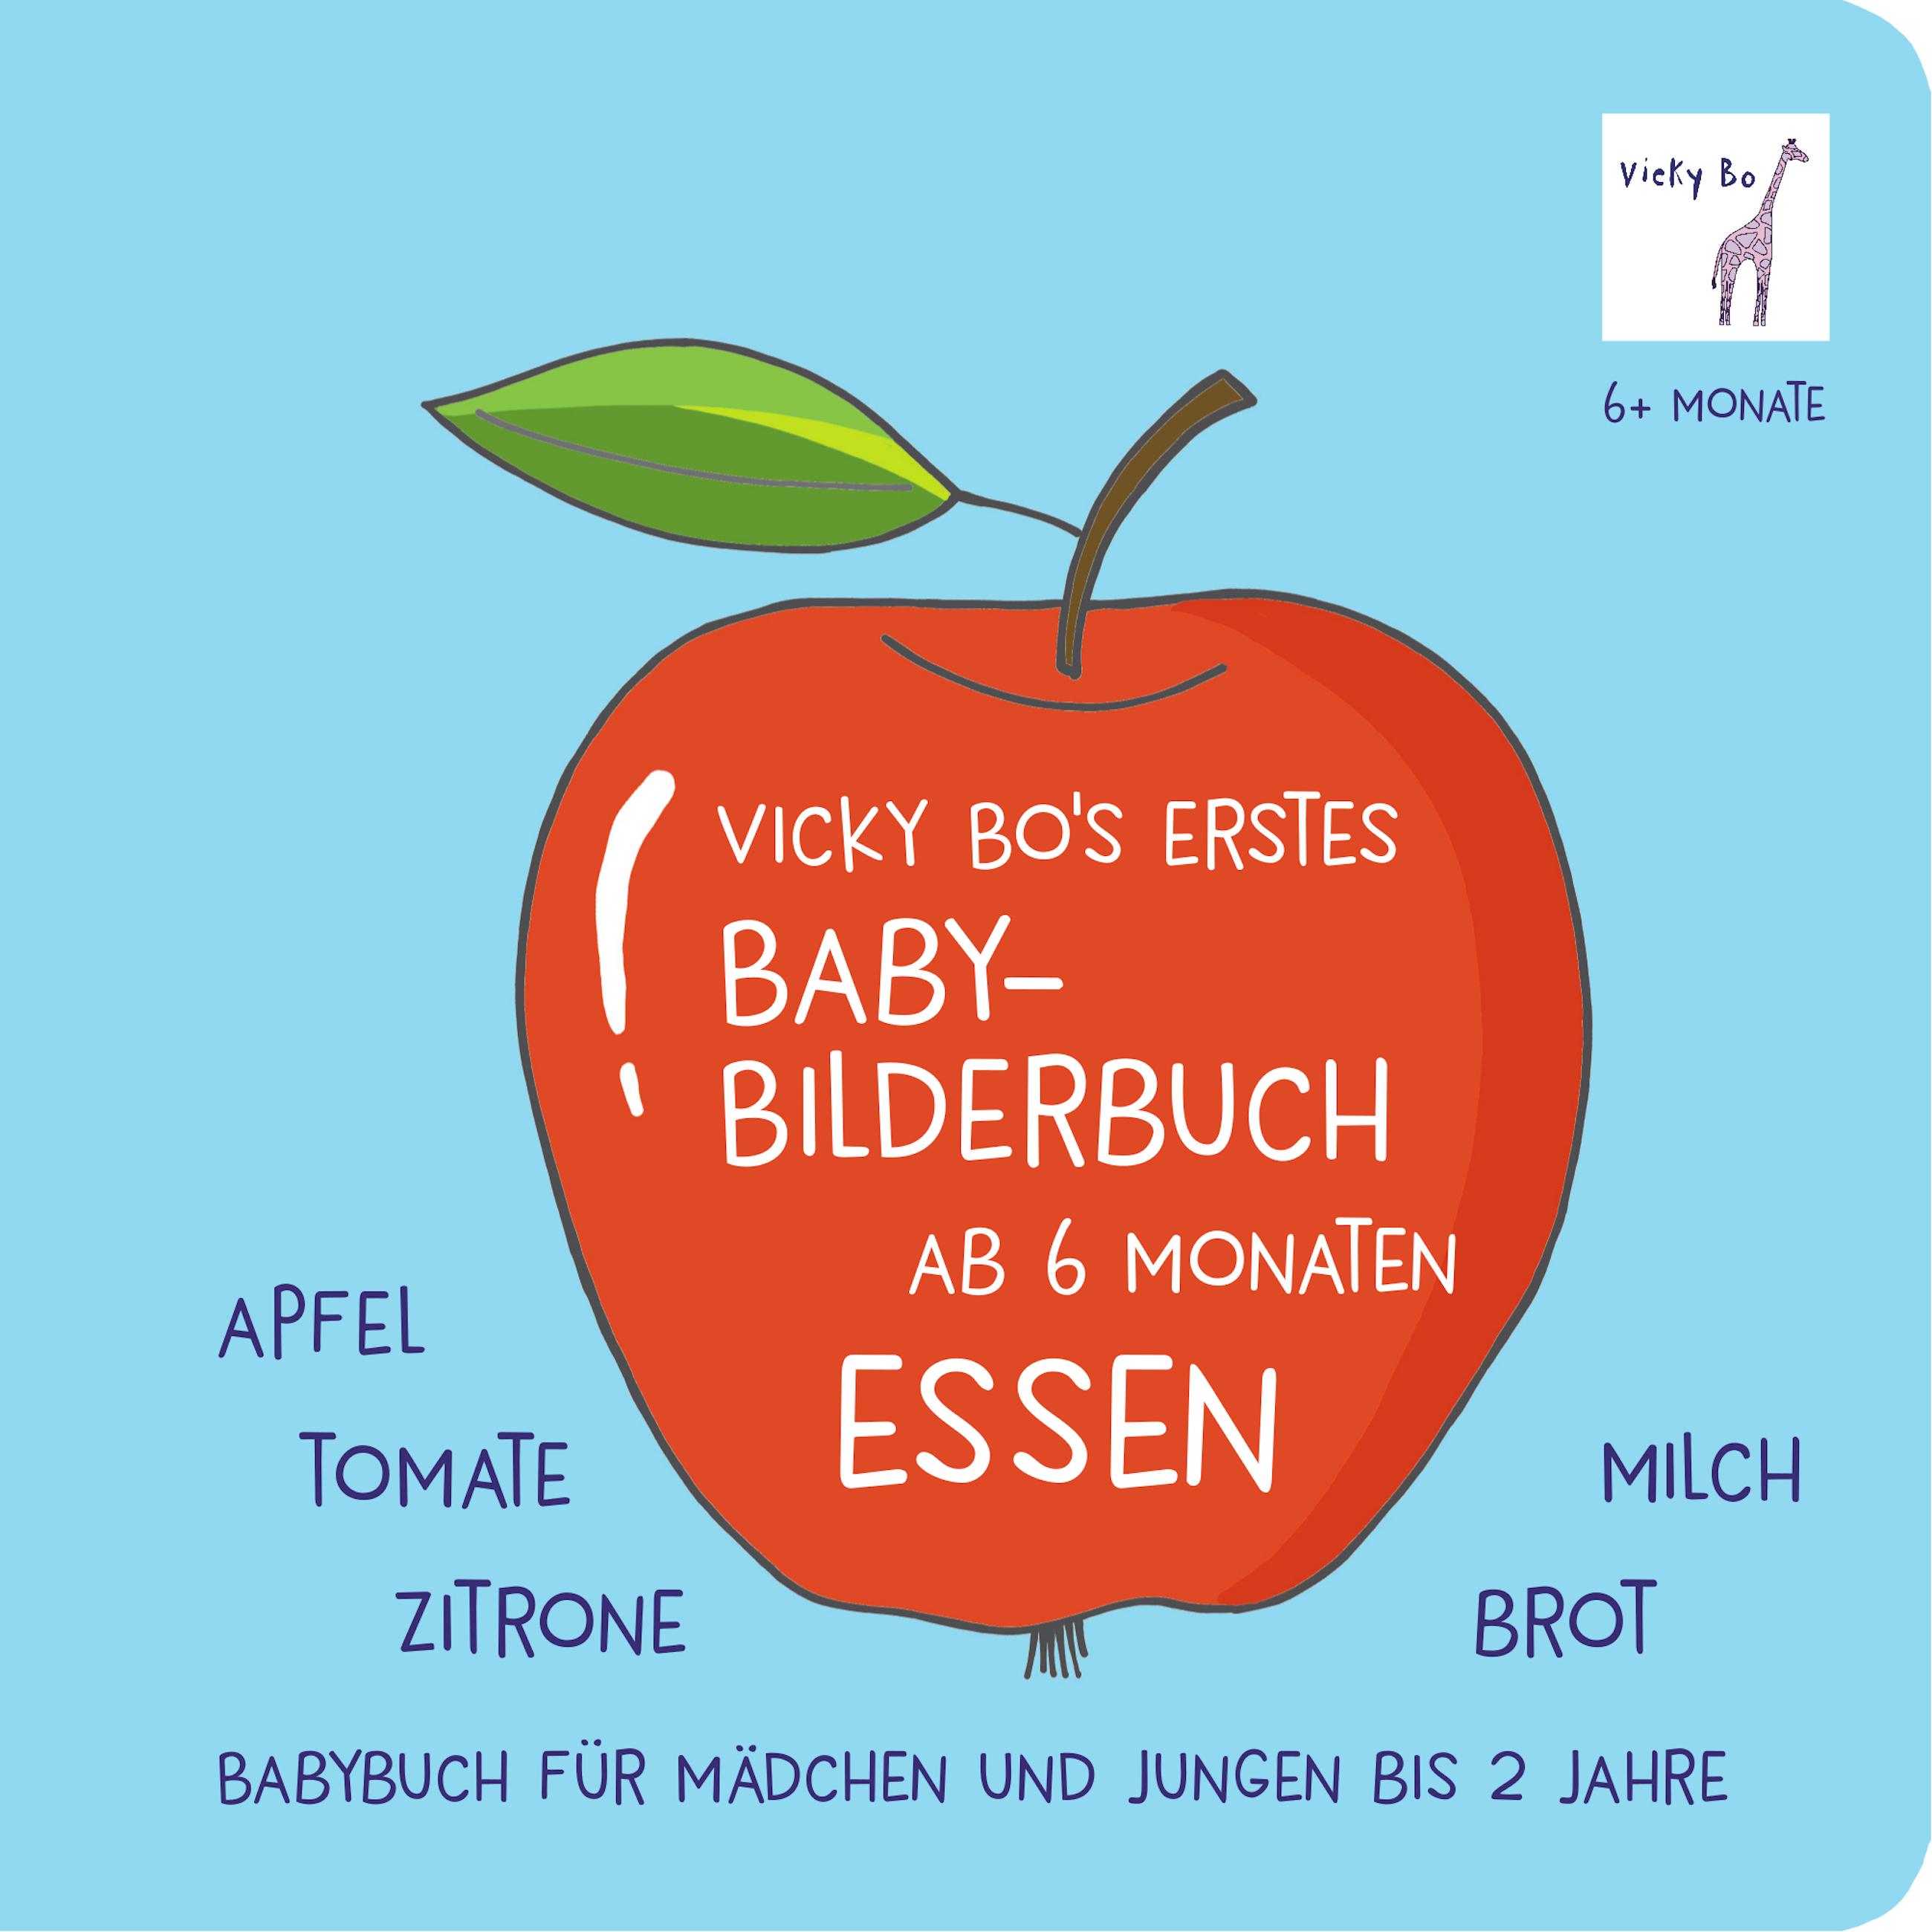 Vicky Bo's erstes Baby-Bilderbuch ab 6 Monaten - Essen,